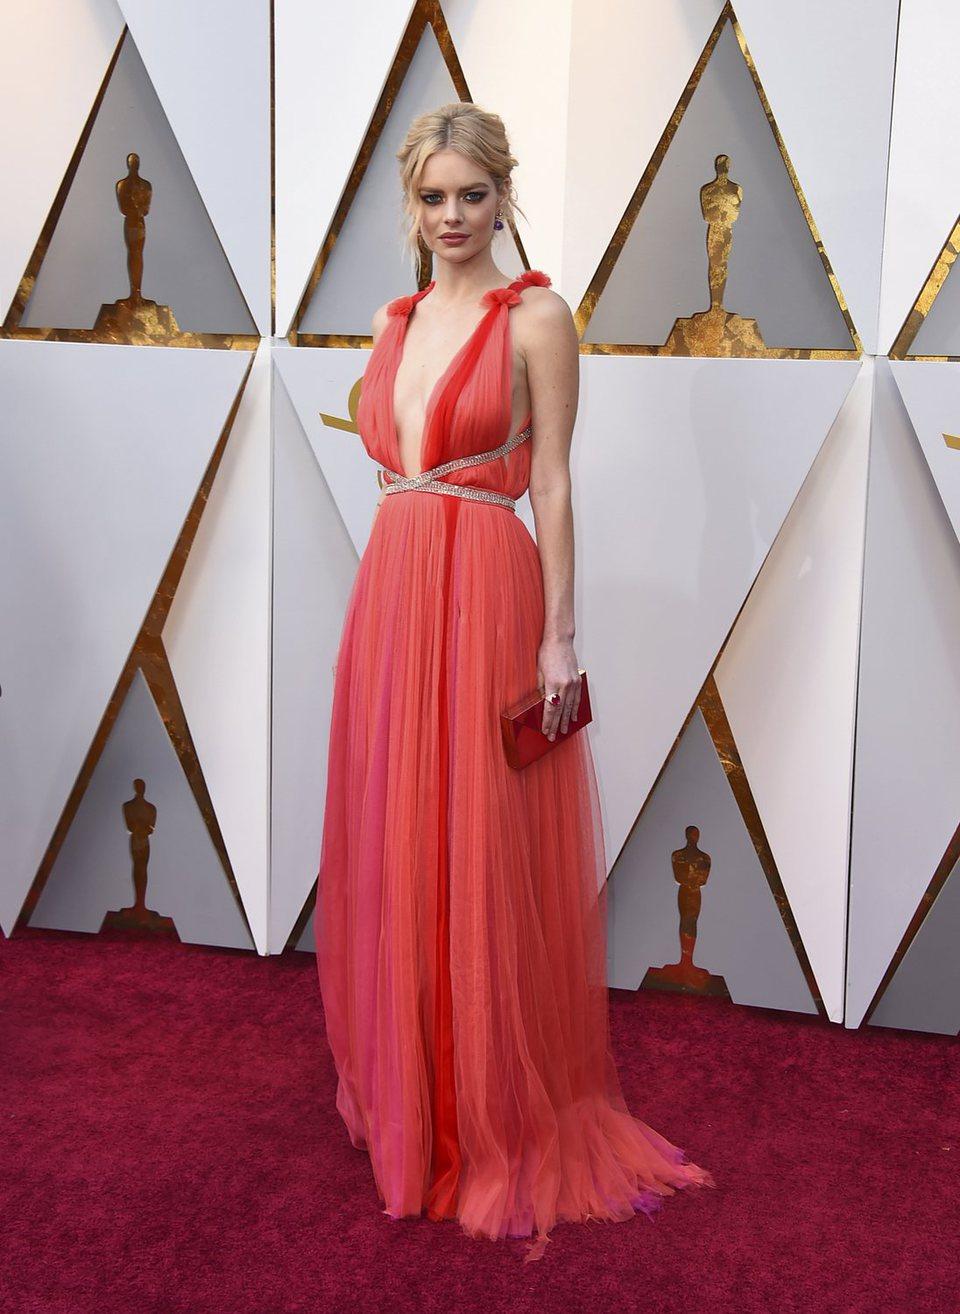 Samara Weaving at the red carpet of the Oscars 2018